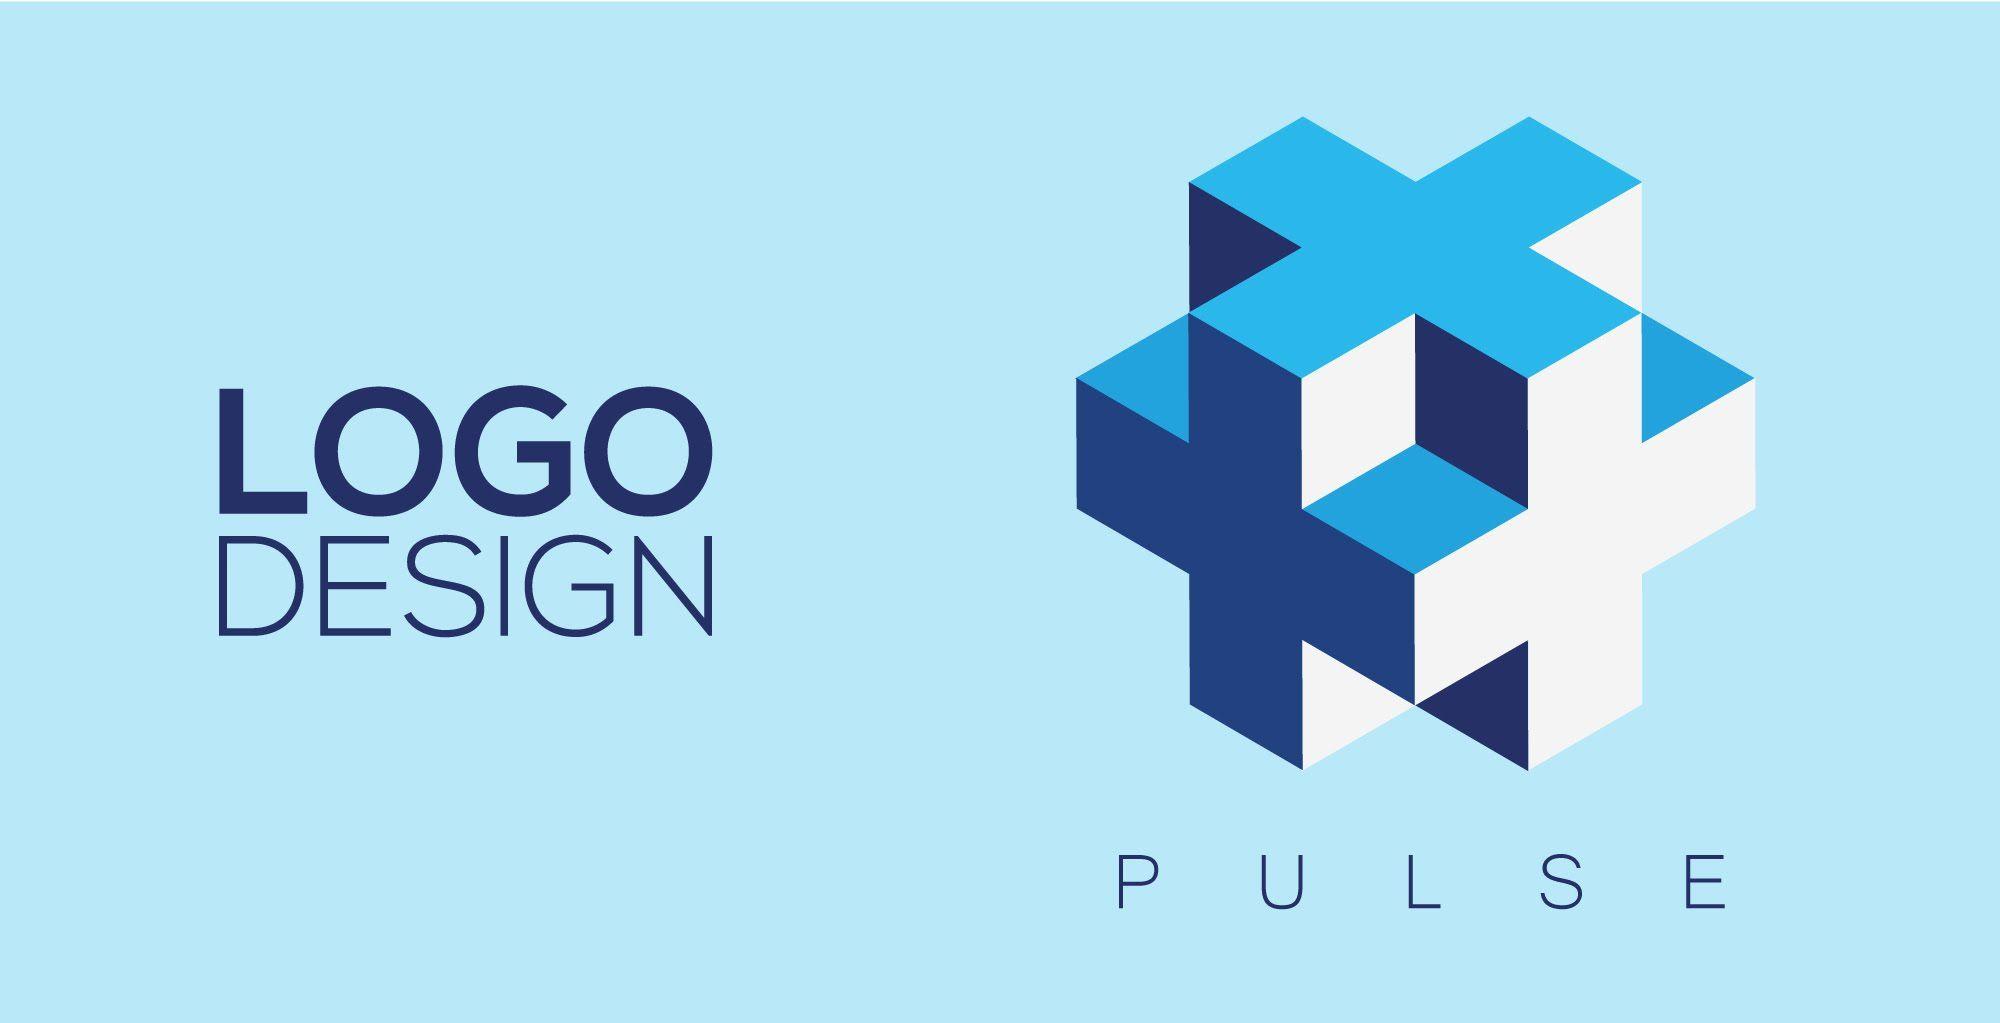 Professional logo design adobe illustrator cc pulse dg professional logo design adobe illustrator cc pulse illustrator tutorialsphotoshop baditri Gallery